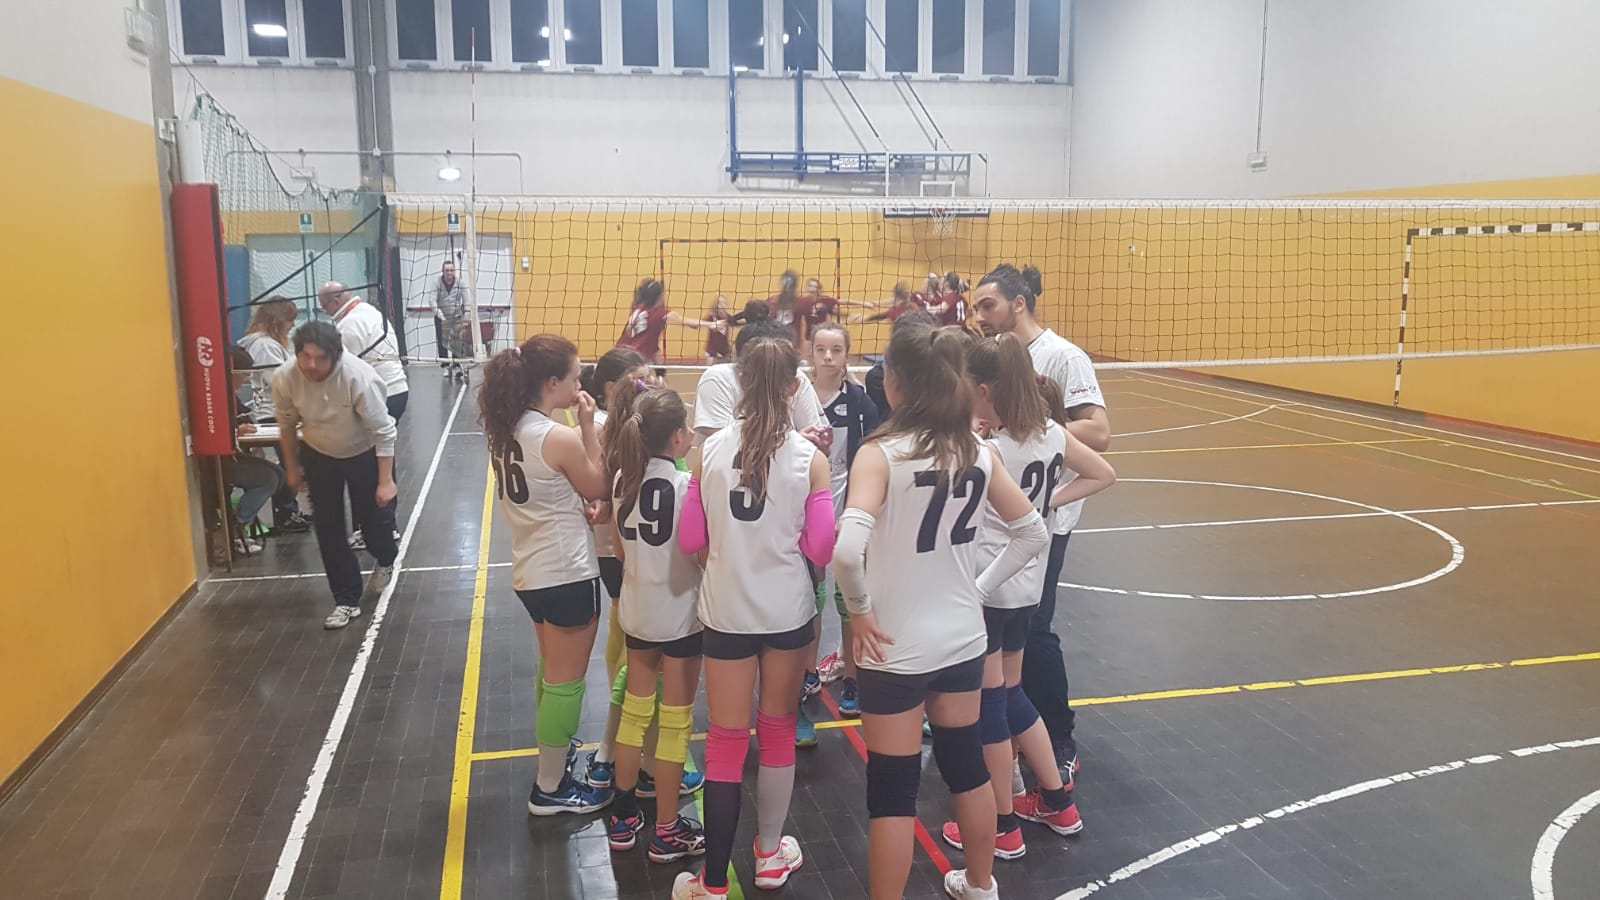 Under 13: Pontevecchio Sysdata A - Clai Vitaldent 2-1